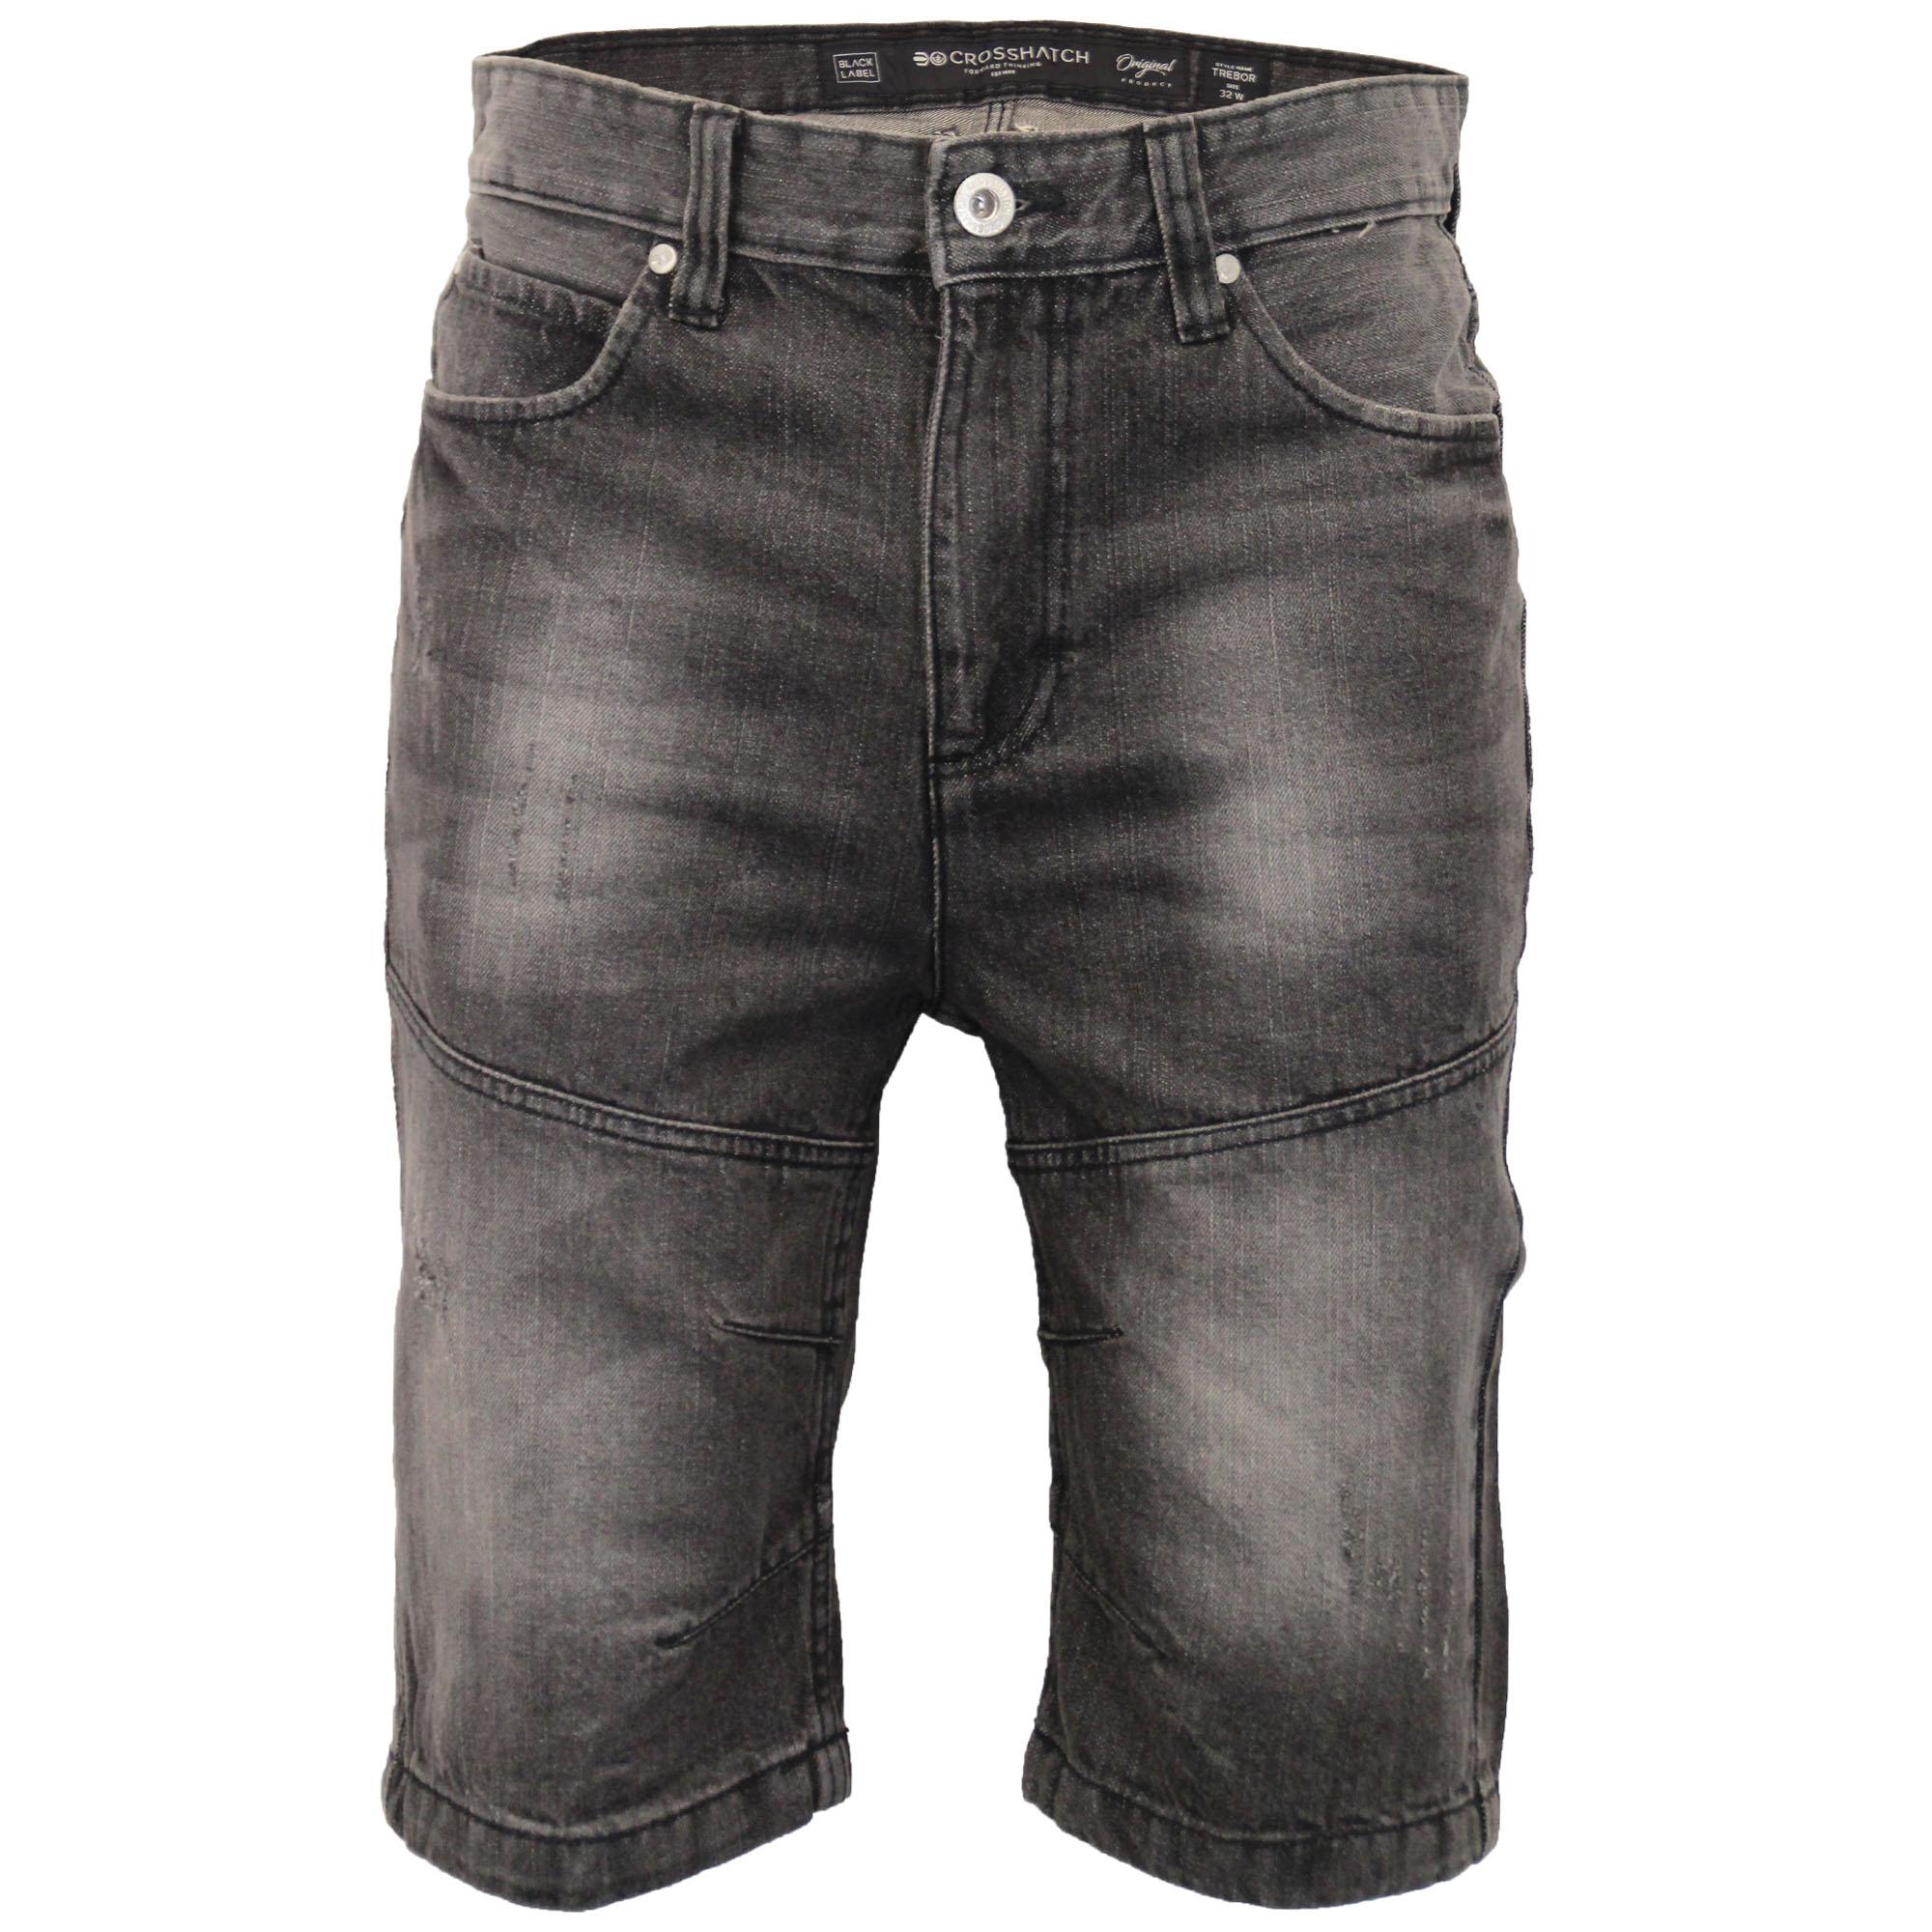 Mens-Crosshatch-Denim-Knee-Length-Combat-Shorts-Cargo-Casual-Fashion-Summer-New 縮圖 8